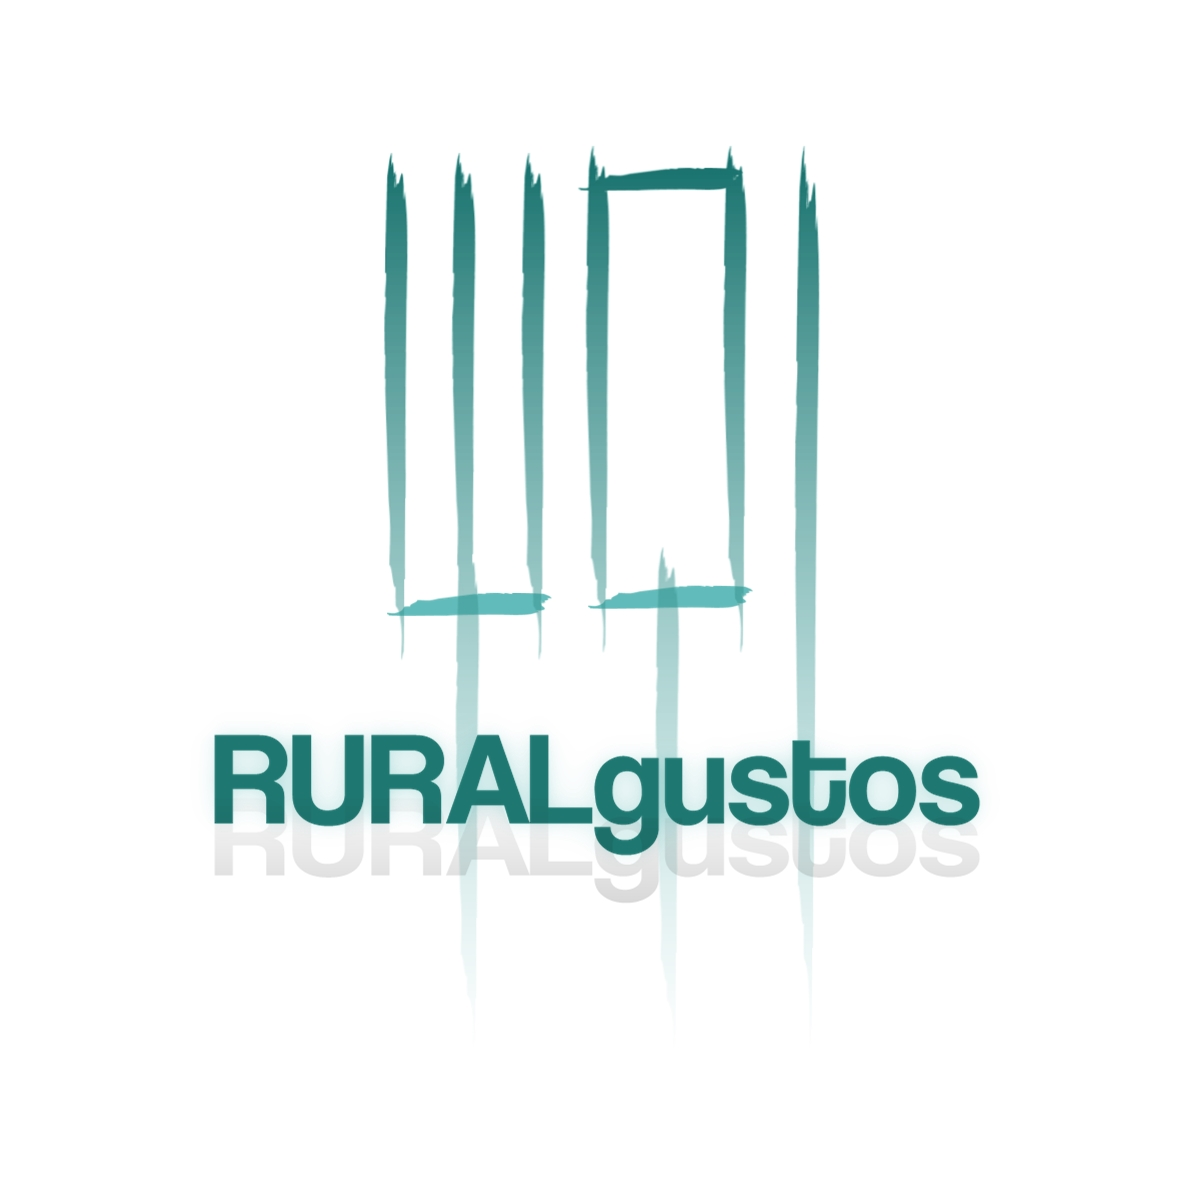 RURALgustos